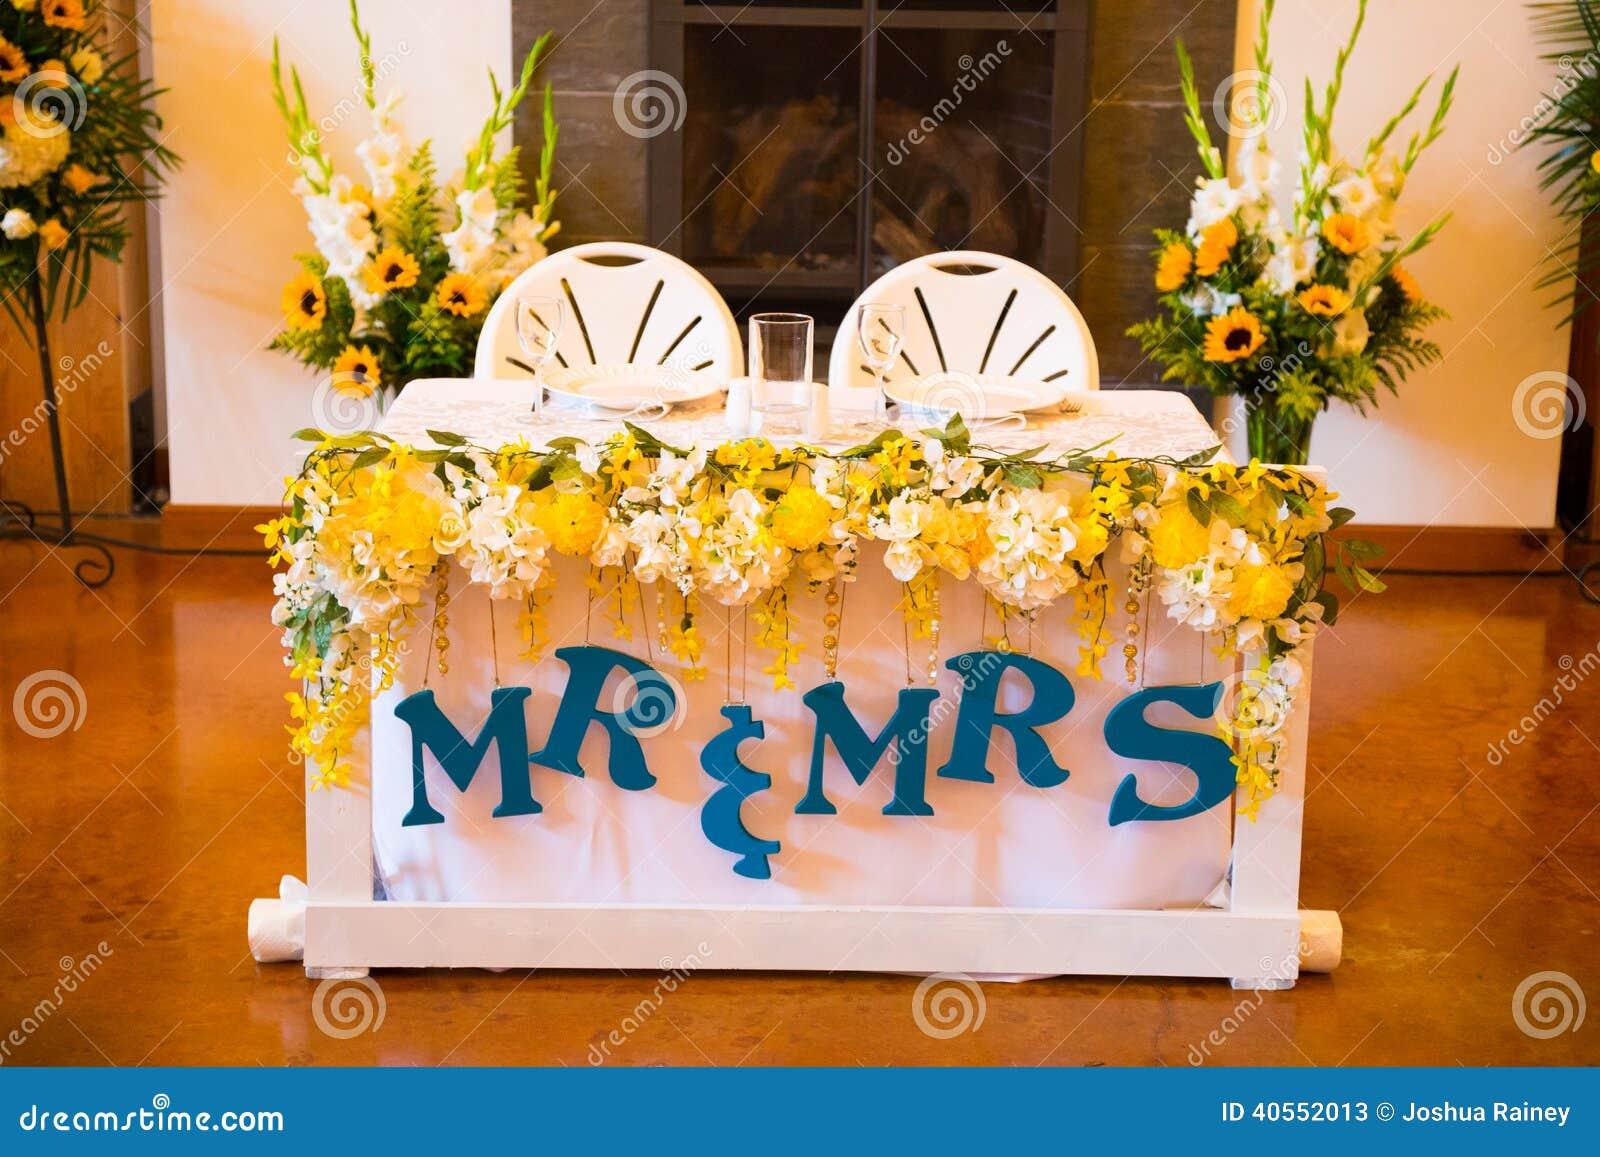 Mr And Mrs Bride Groom Wedding Table Stock Photo